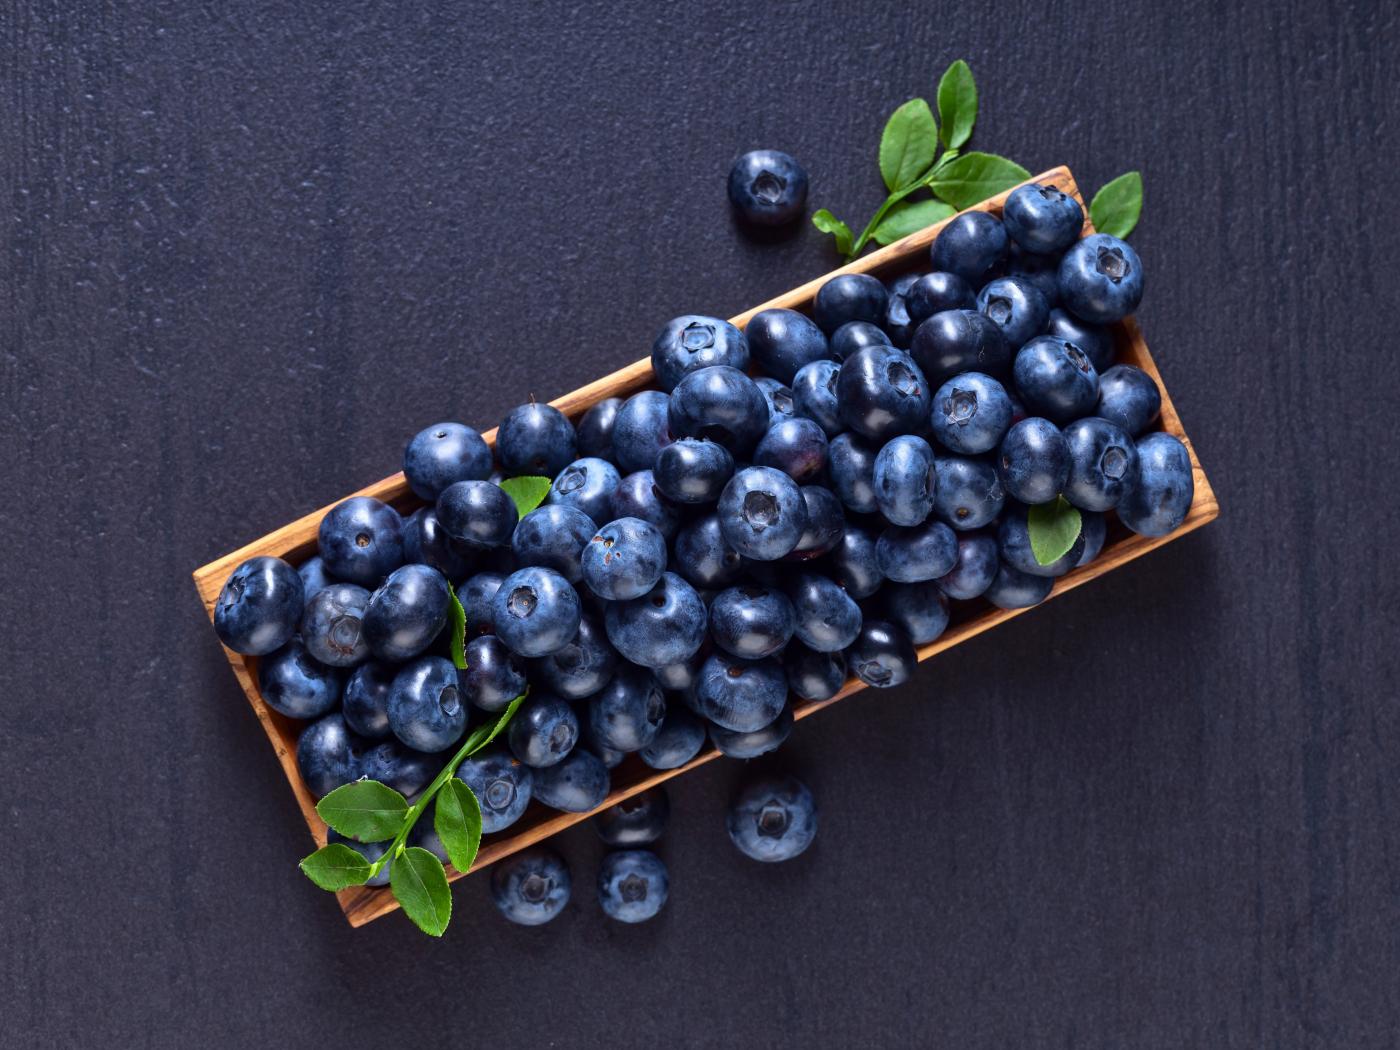 1400x1050 wallpaper Blueberry, berries, fruits